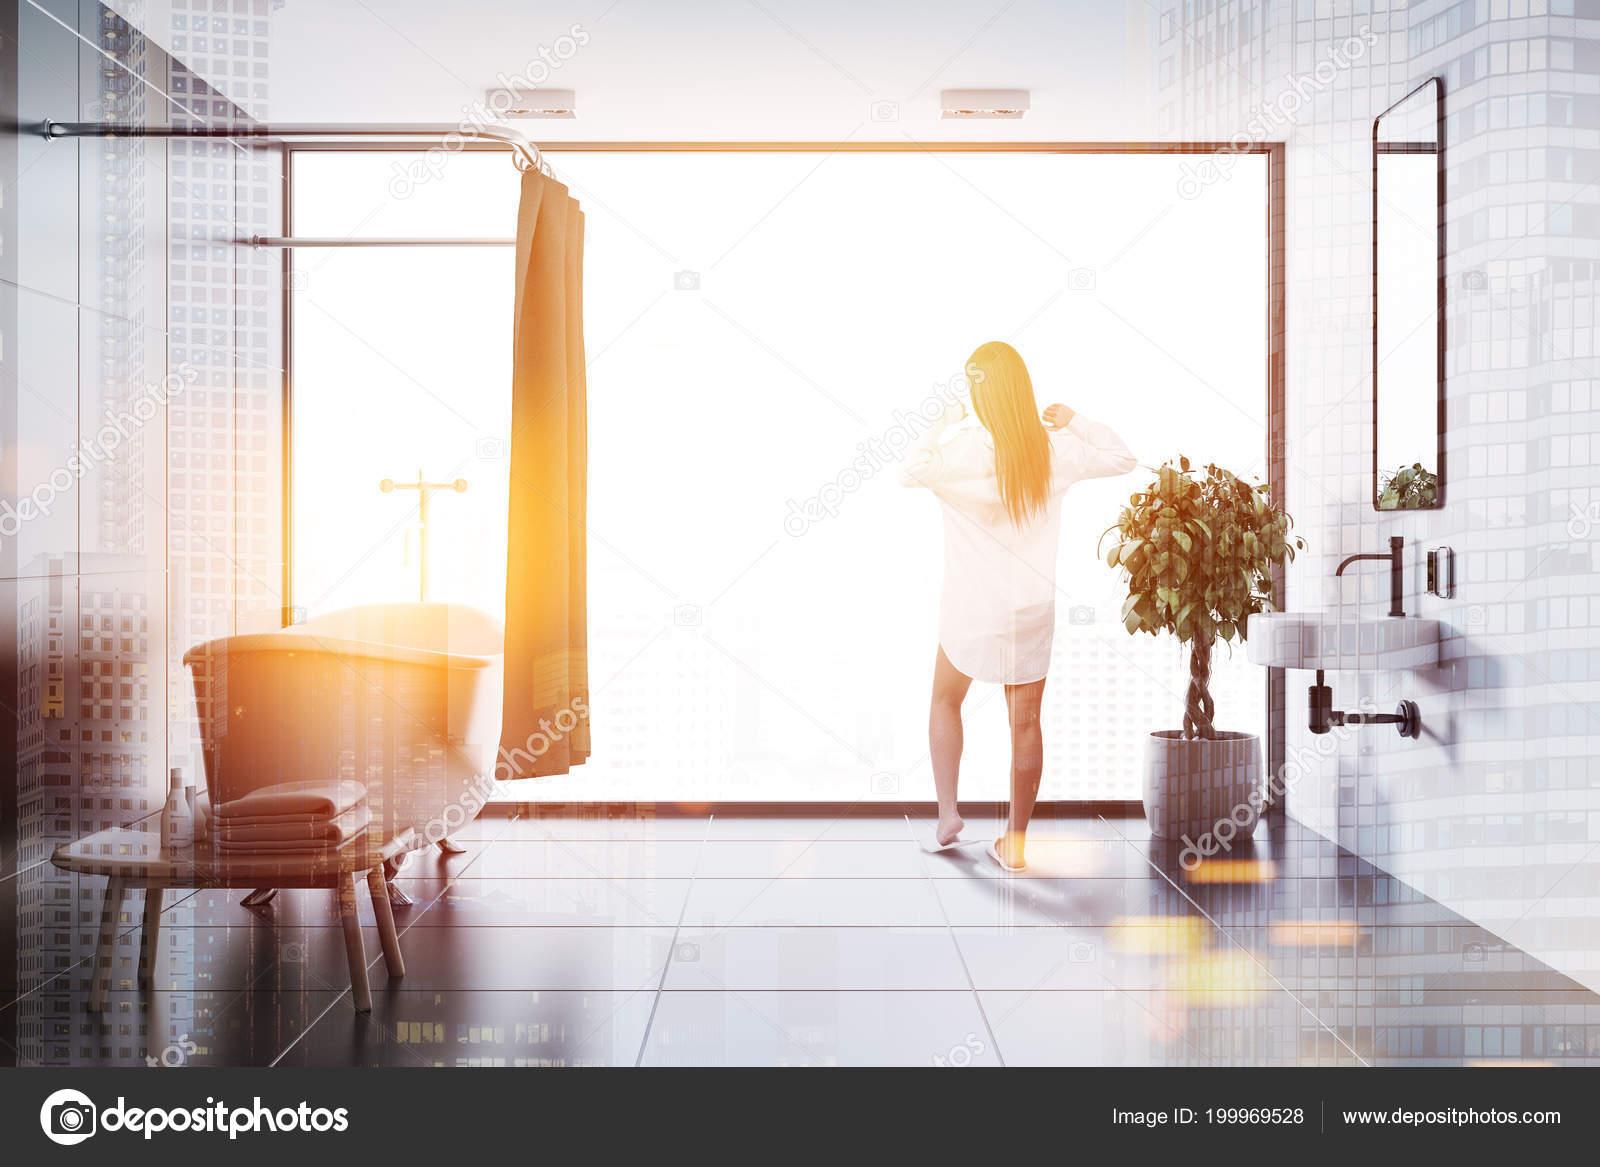 Woman Black Tile Bathroom Interior Black Tile Floor White Bathtub ...